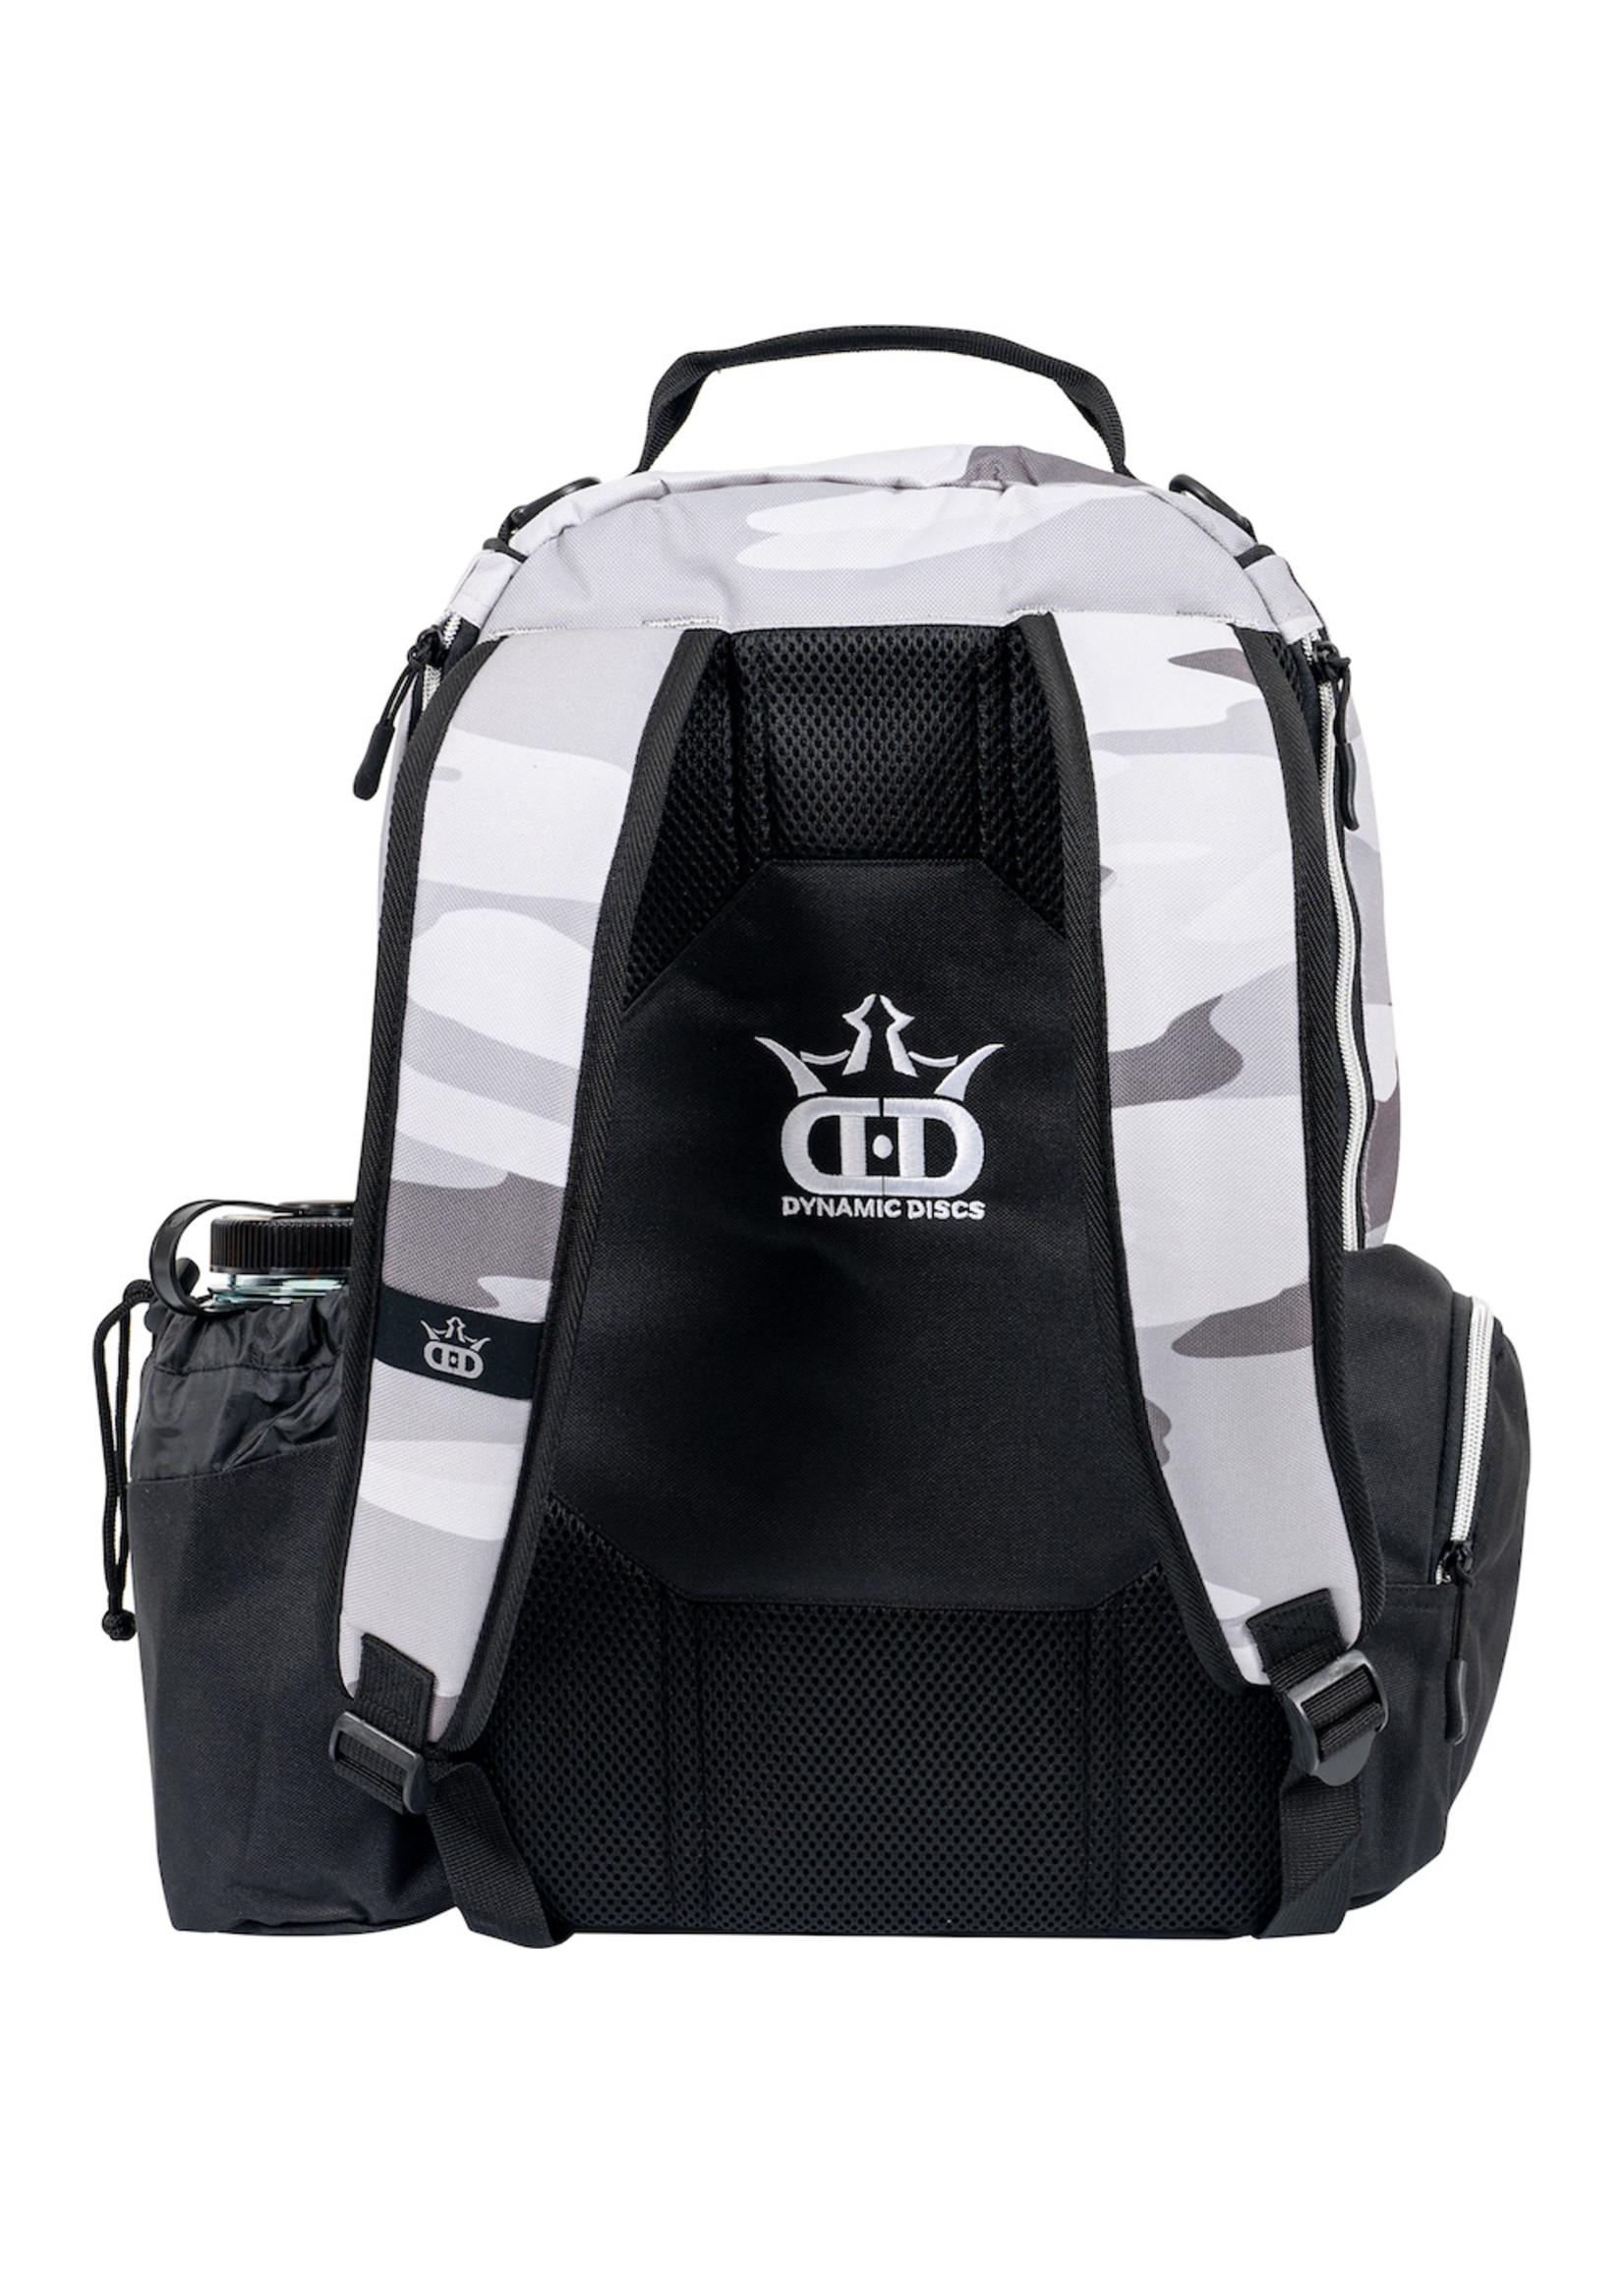 Dynamic Discs Dynamic Discs Trooper Disc Golf Backpack